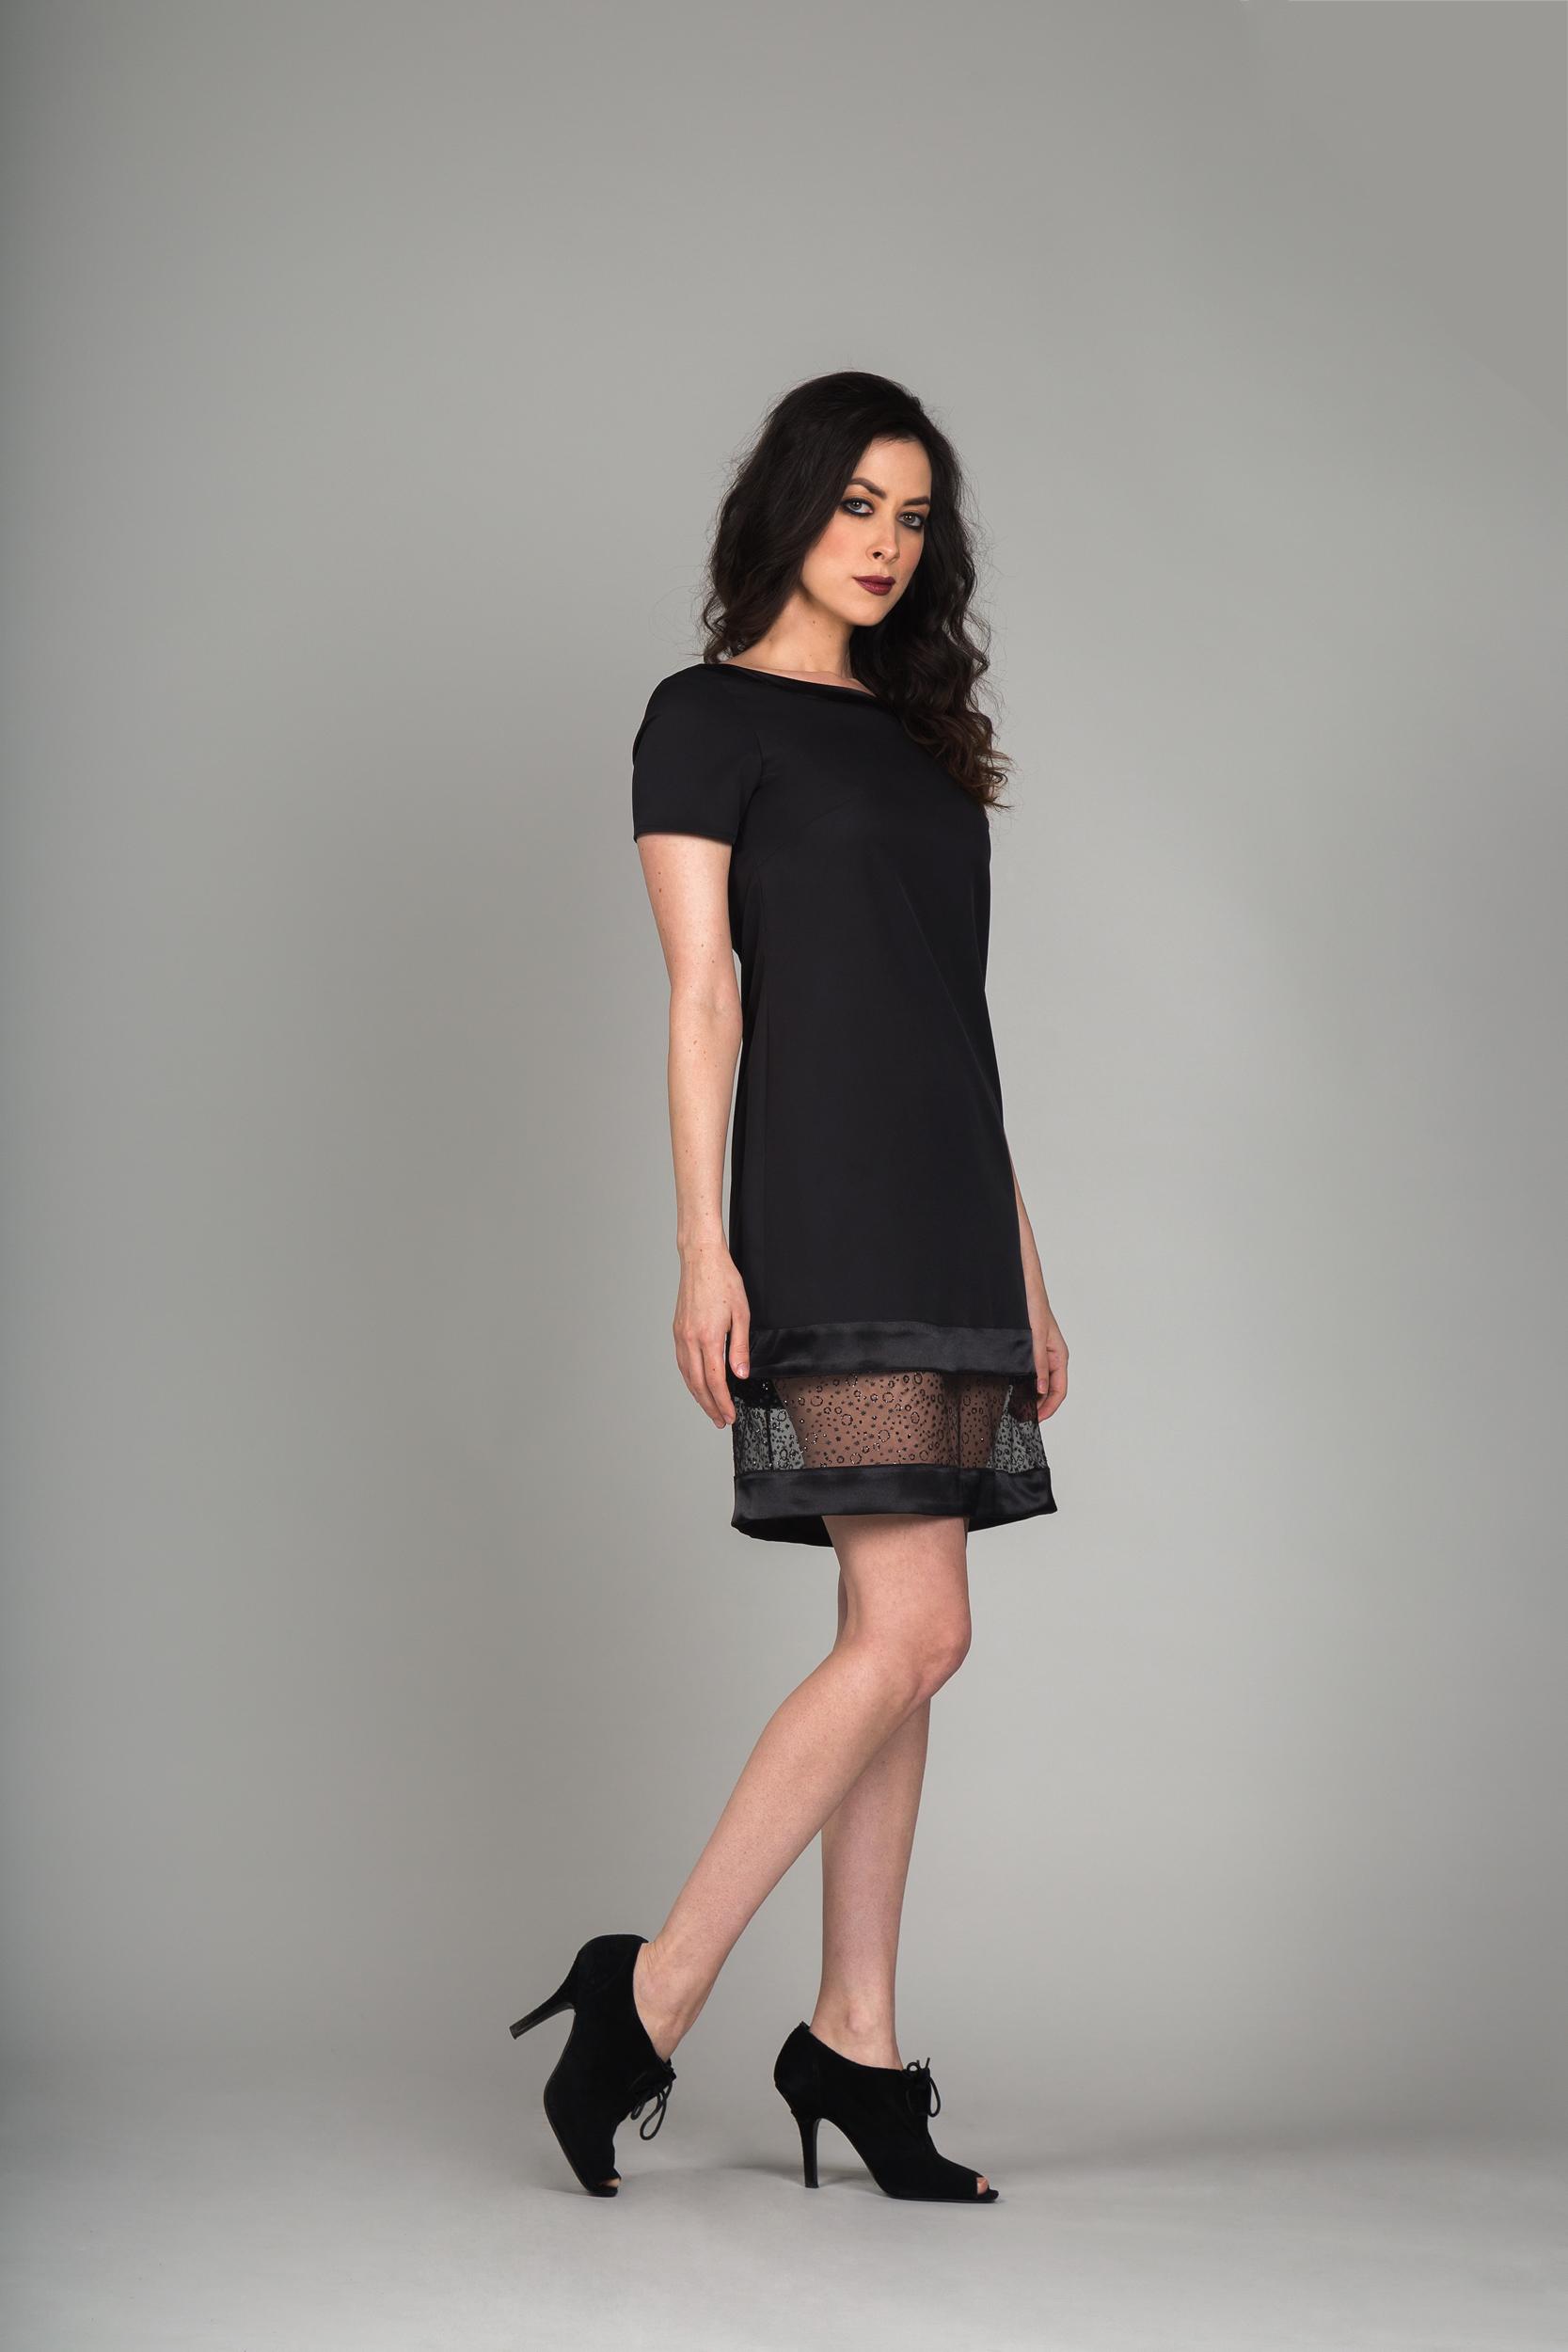 BhavyJ Designs Natasha Dress  $80